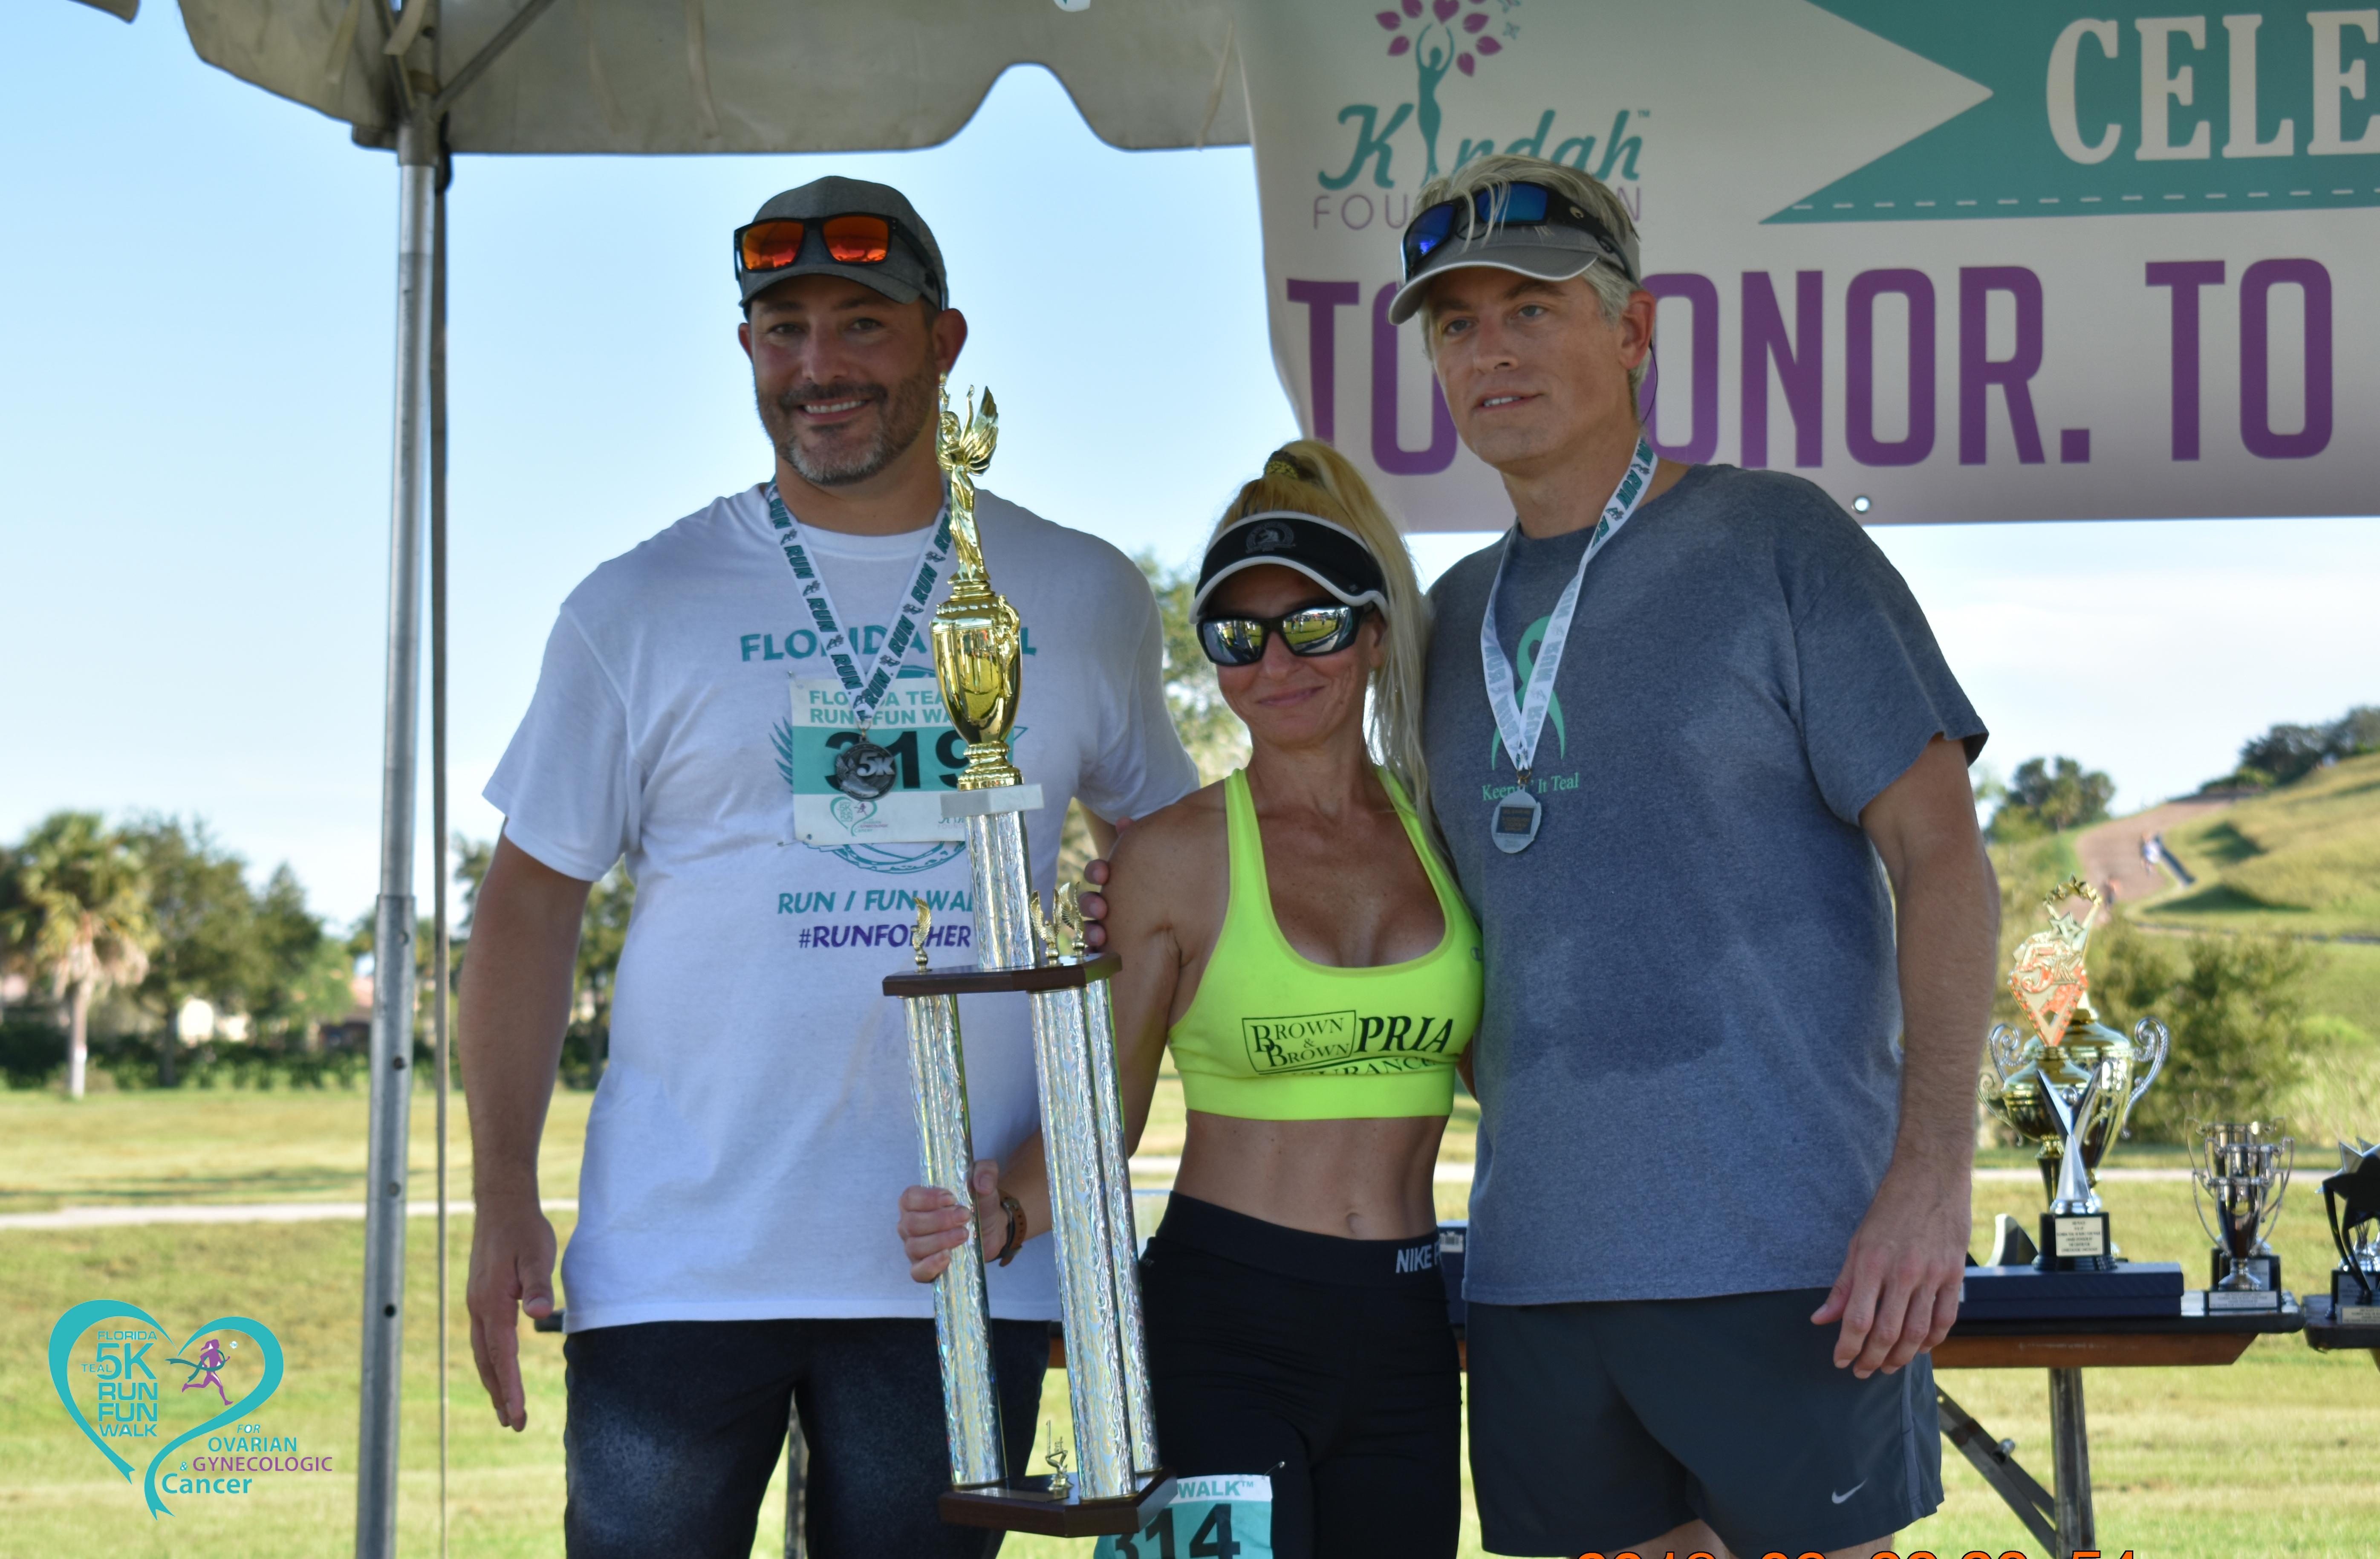 DSC 0192 - Florida Teal 5K Run & Fun